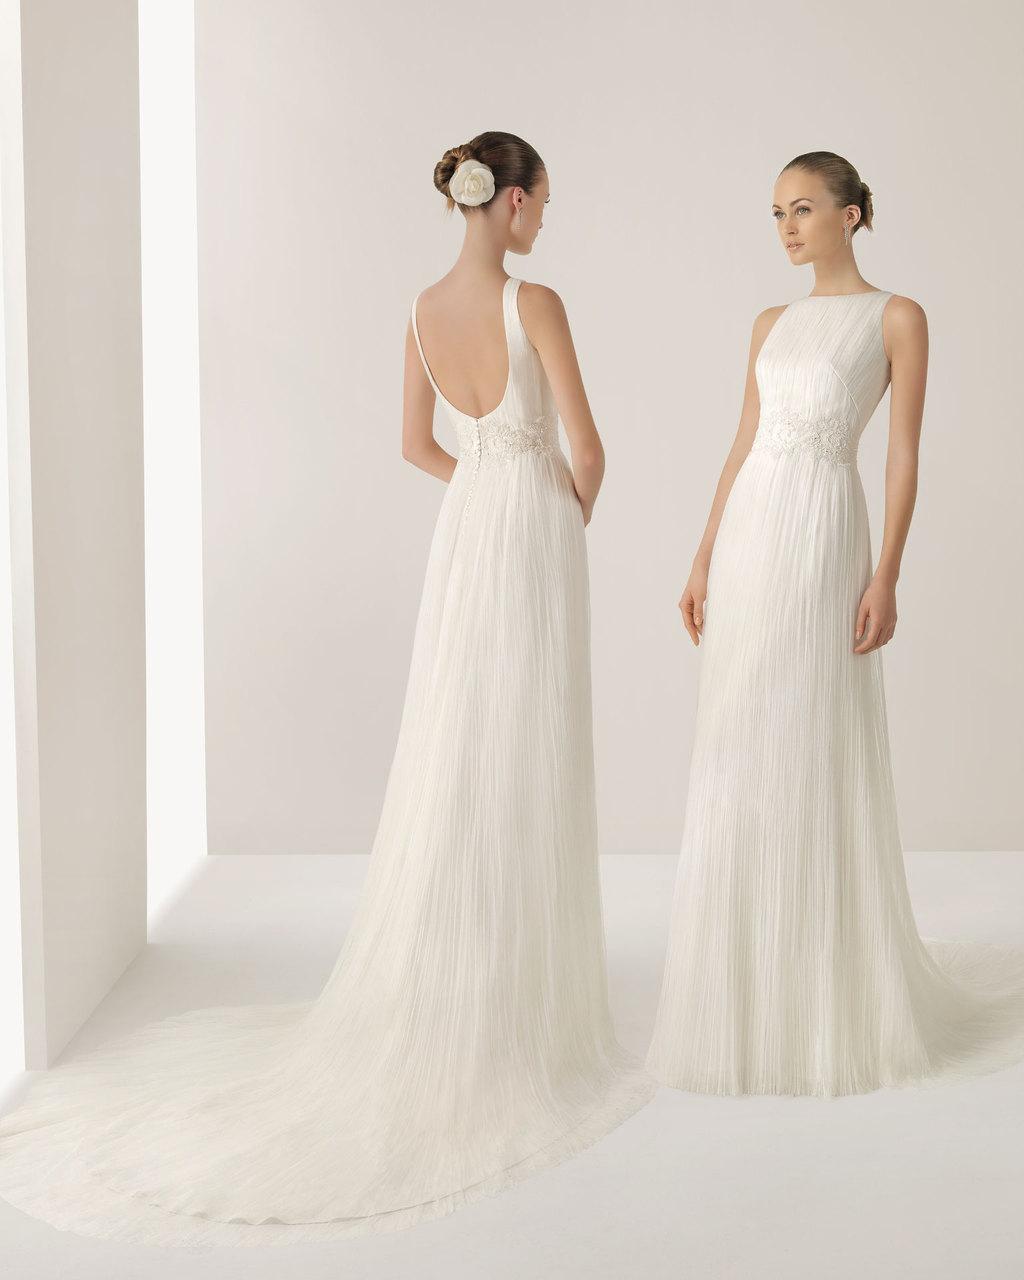 Wedding dress soft by rosa clara bridal gowns jordan 2013 wedding dress soft by rosa clara bridal gowns jordan ombrellifo Choice Image